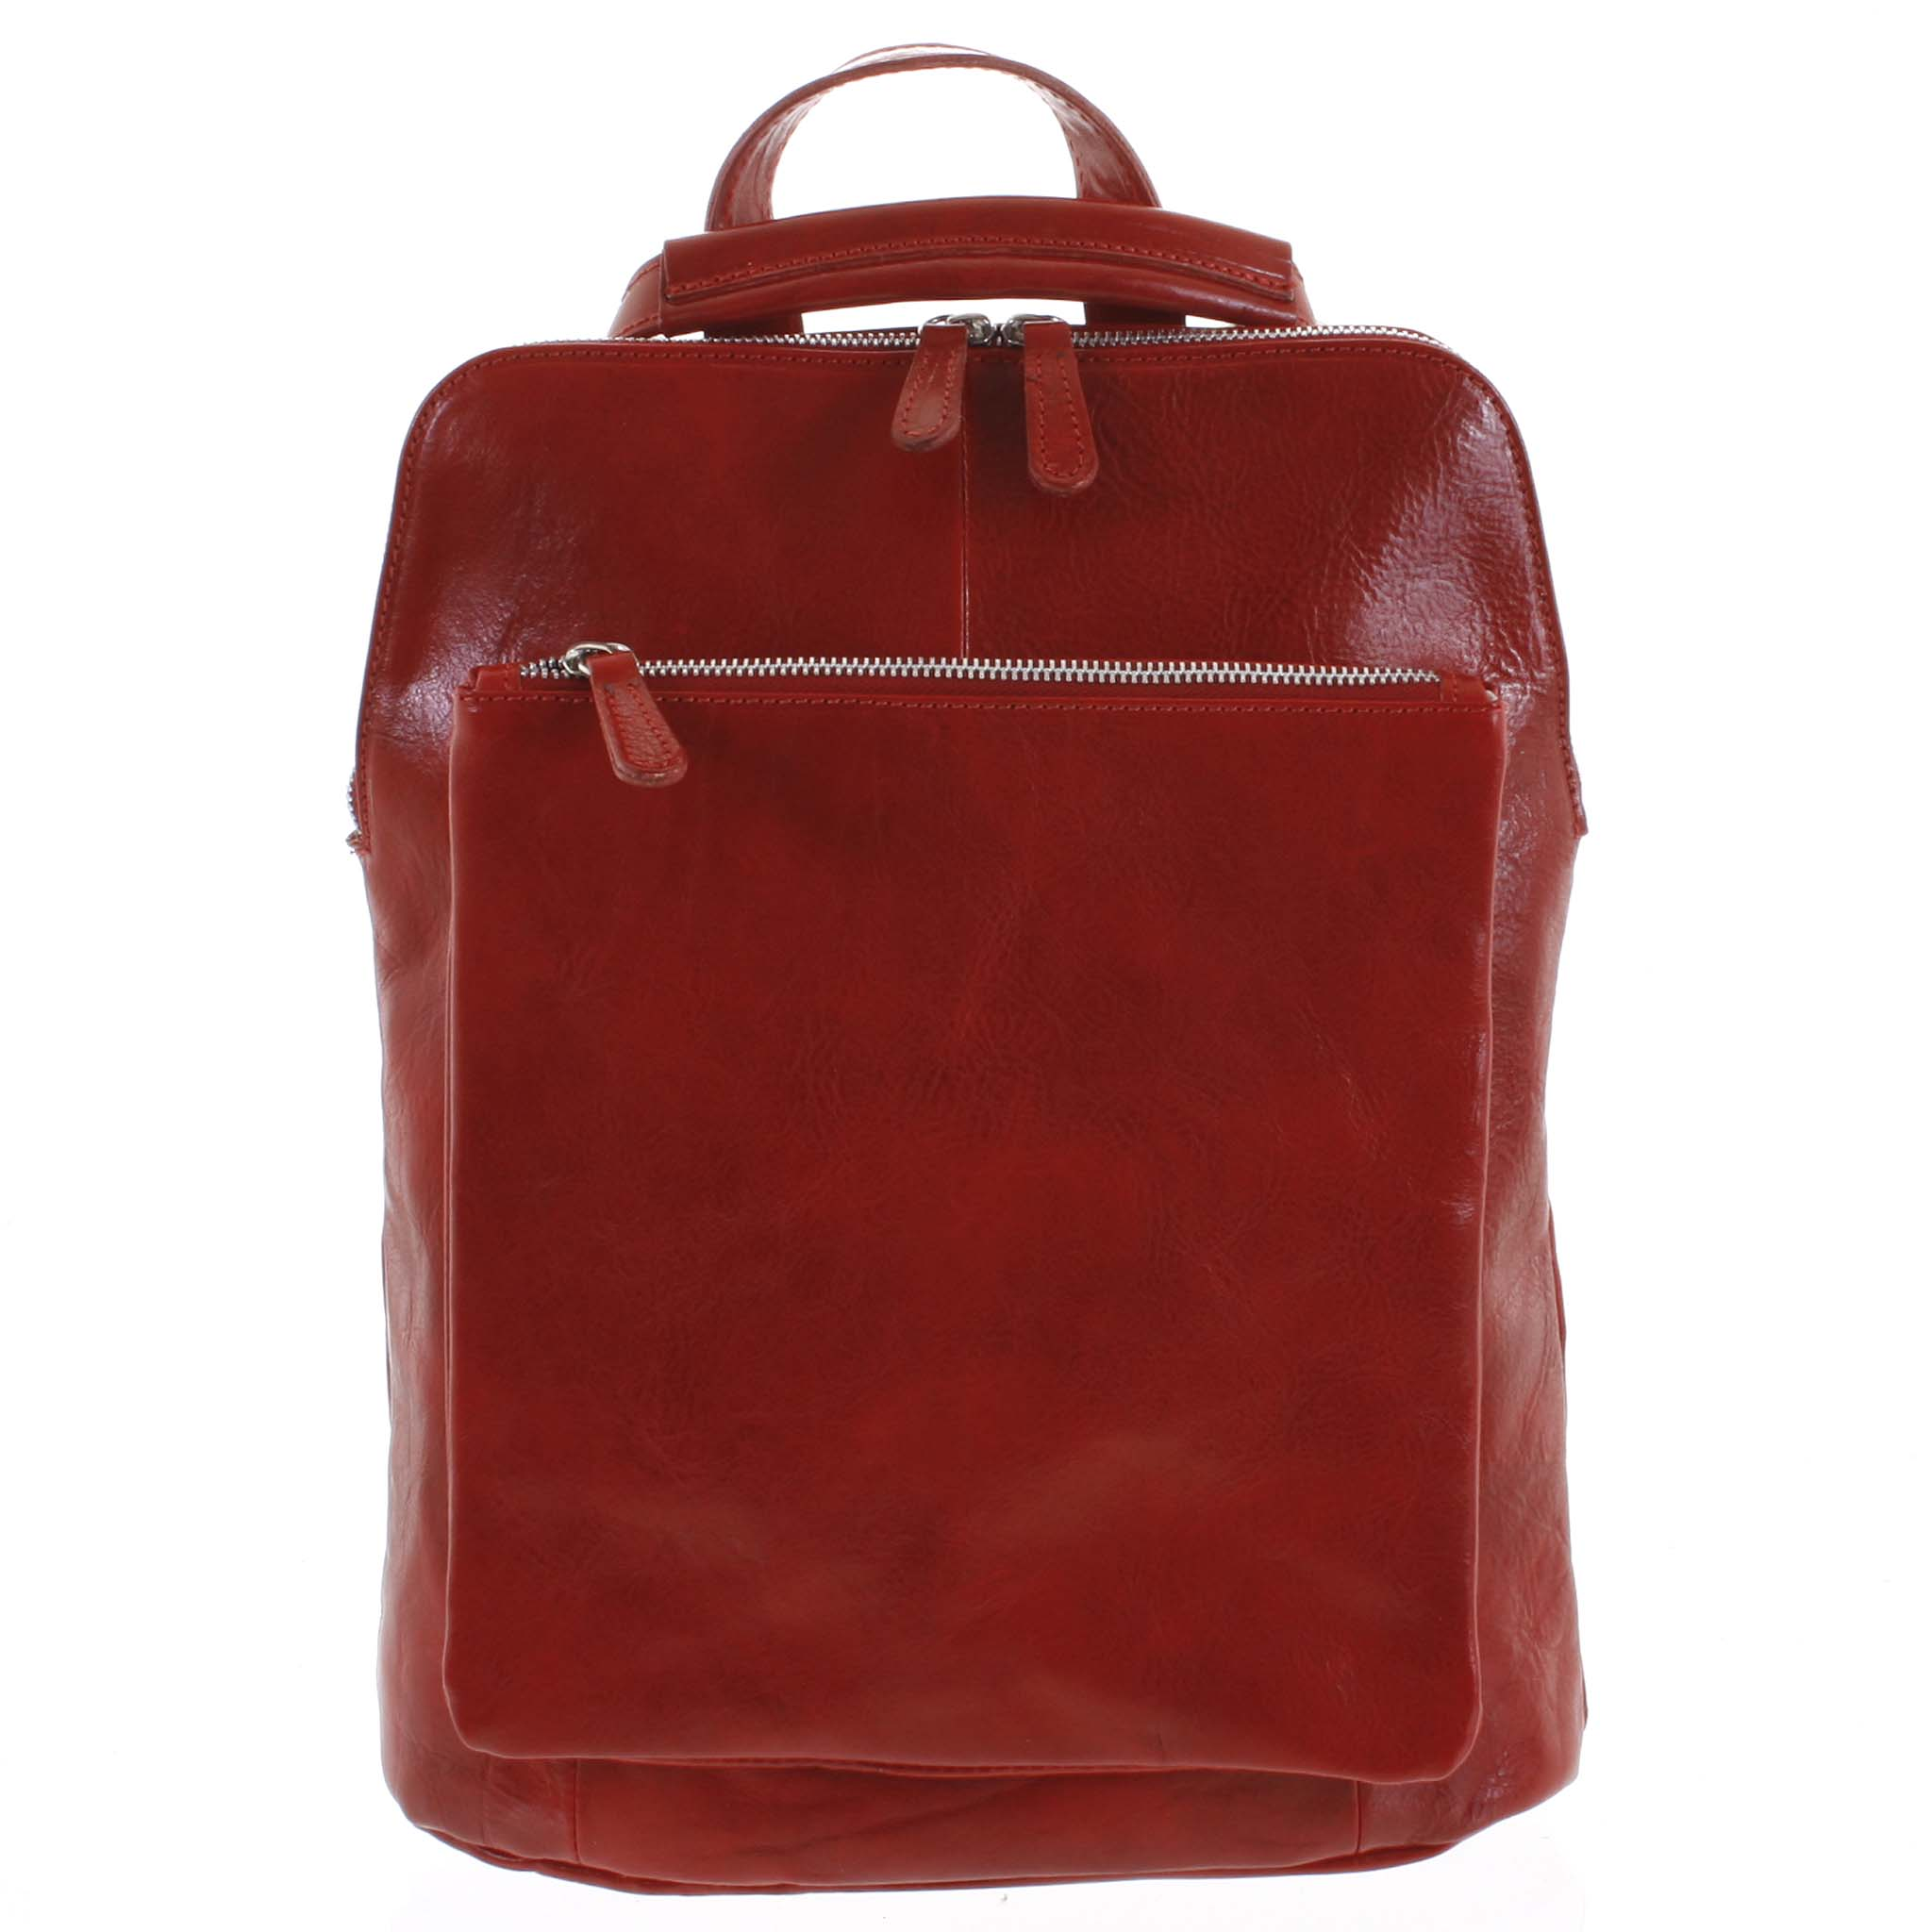 Dámský kožený batoh kabelka červený - ItalY Englidis